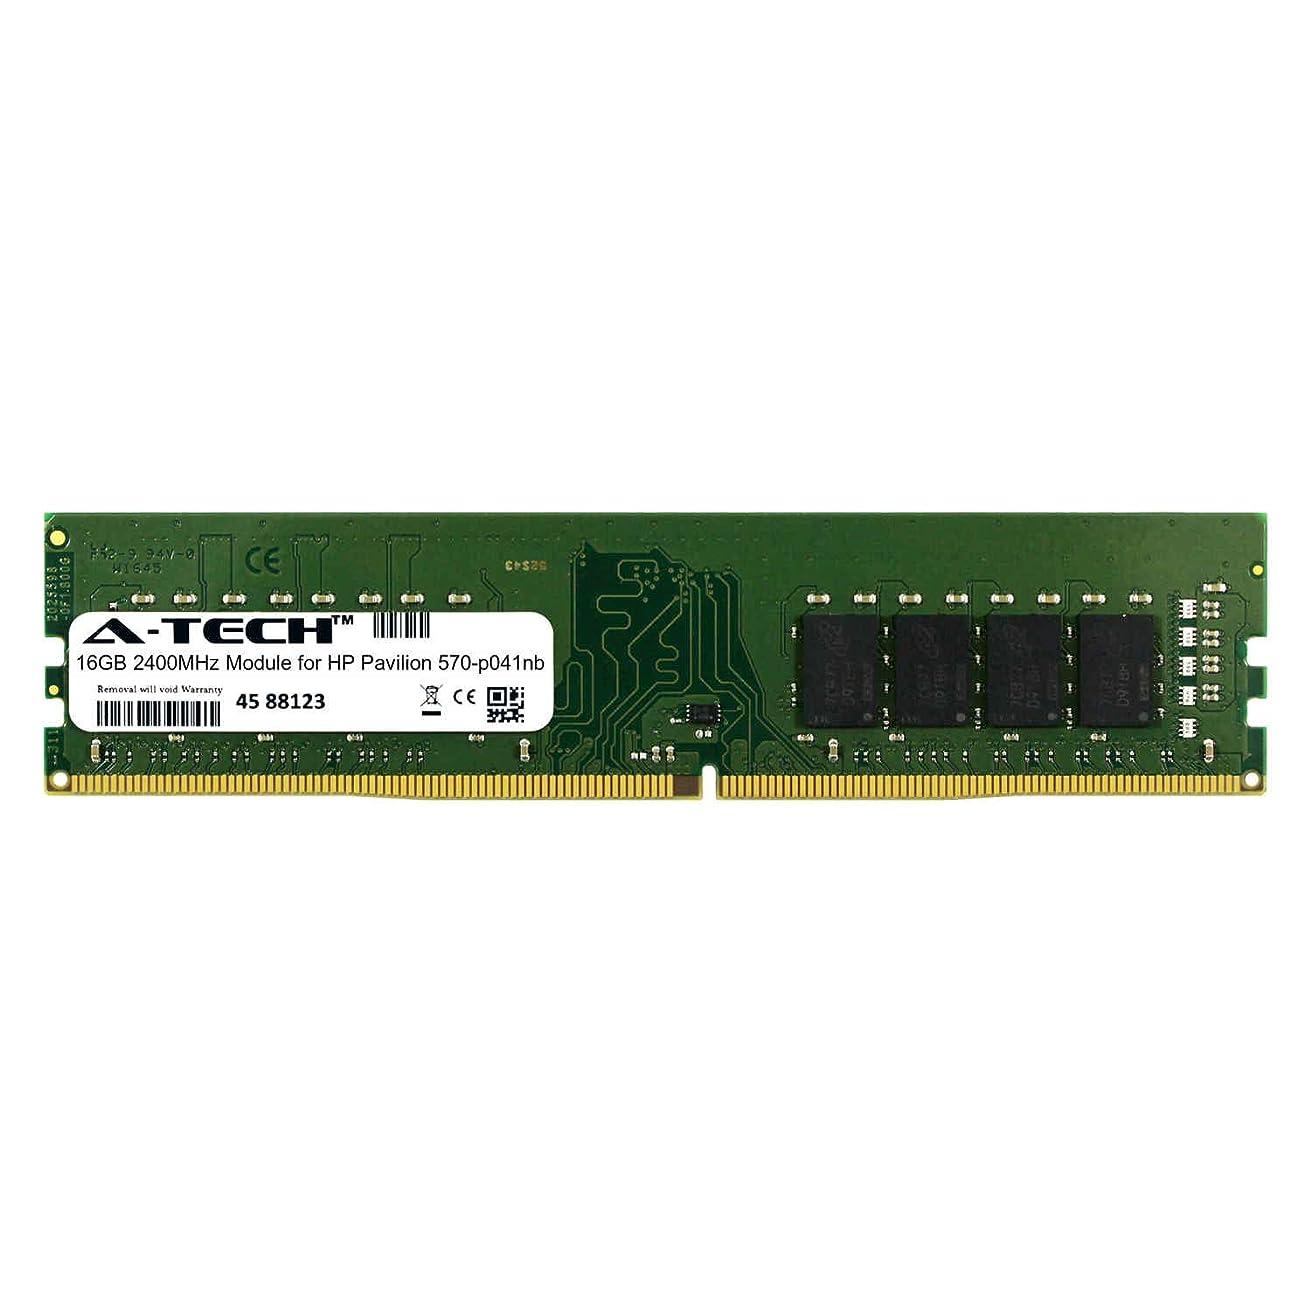 A-Tech 16GB Module for HP Pavilion 570-p041nb Desktop & Workstation Motherboard Compatible DDR4 2400Mhz Memory Ram (ATMS311022A25822X1)